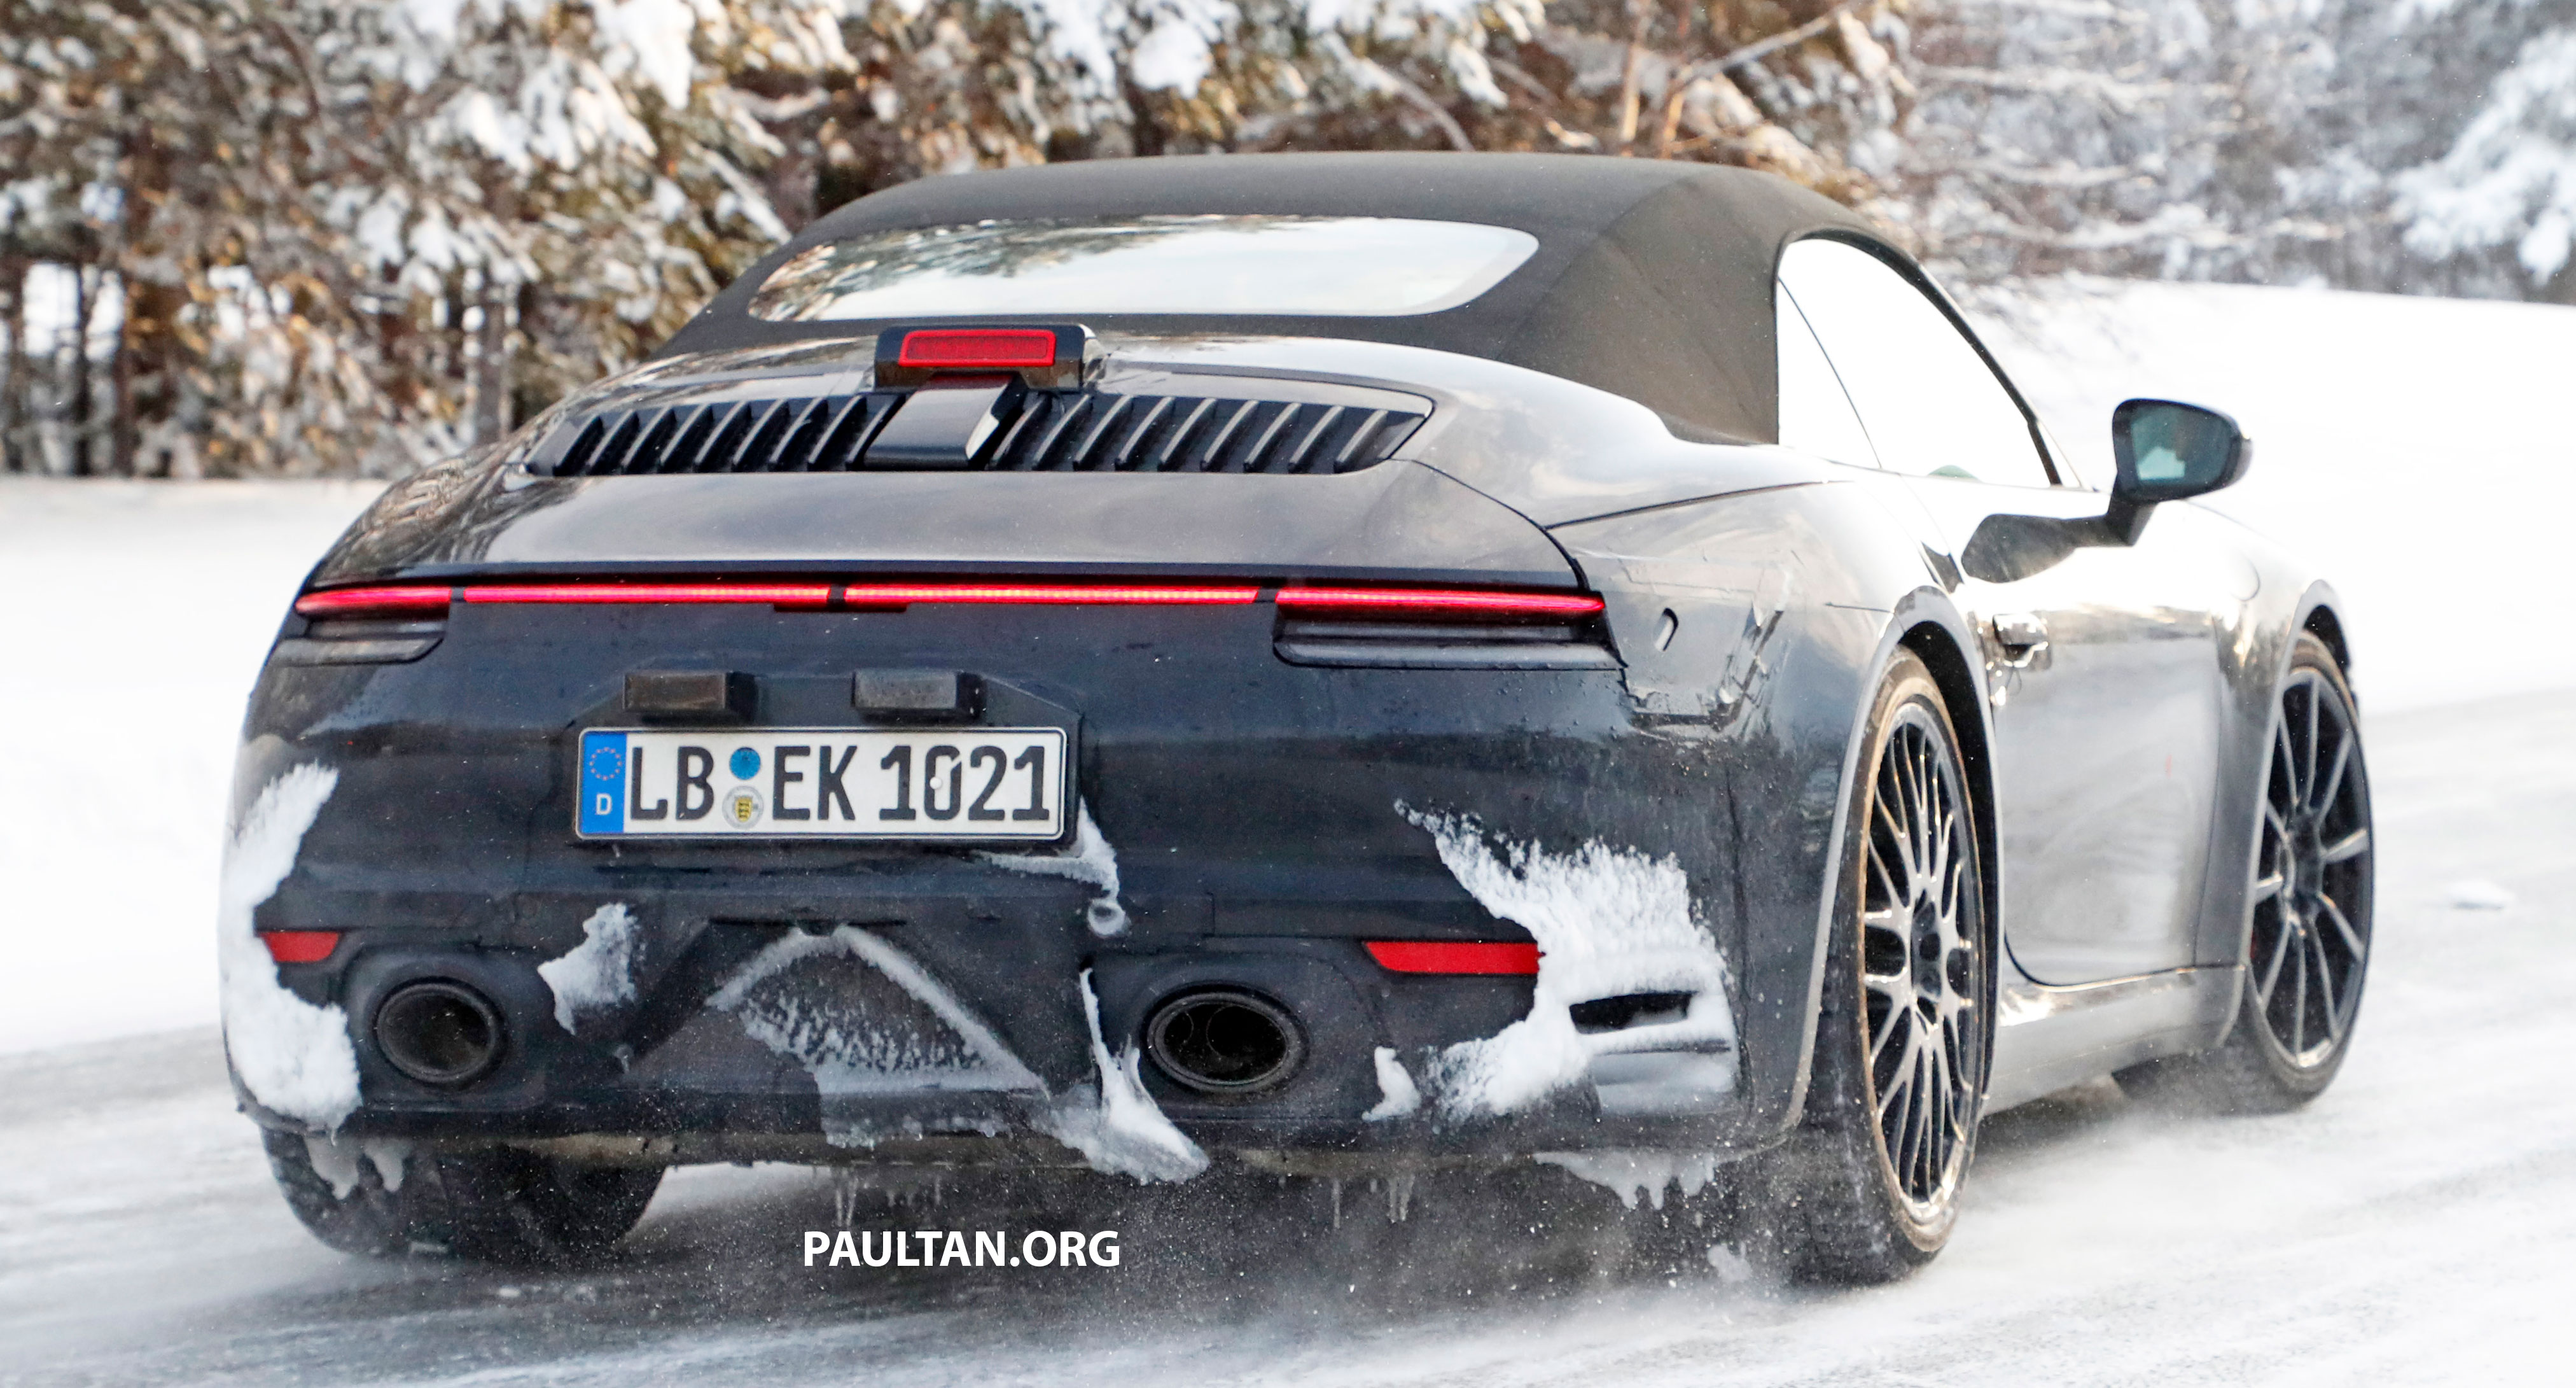 Porsche 911 2019 >> 2019 Porsche 911 teased; spyshots reveal 992 interior Paul Tan - Image 783022